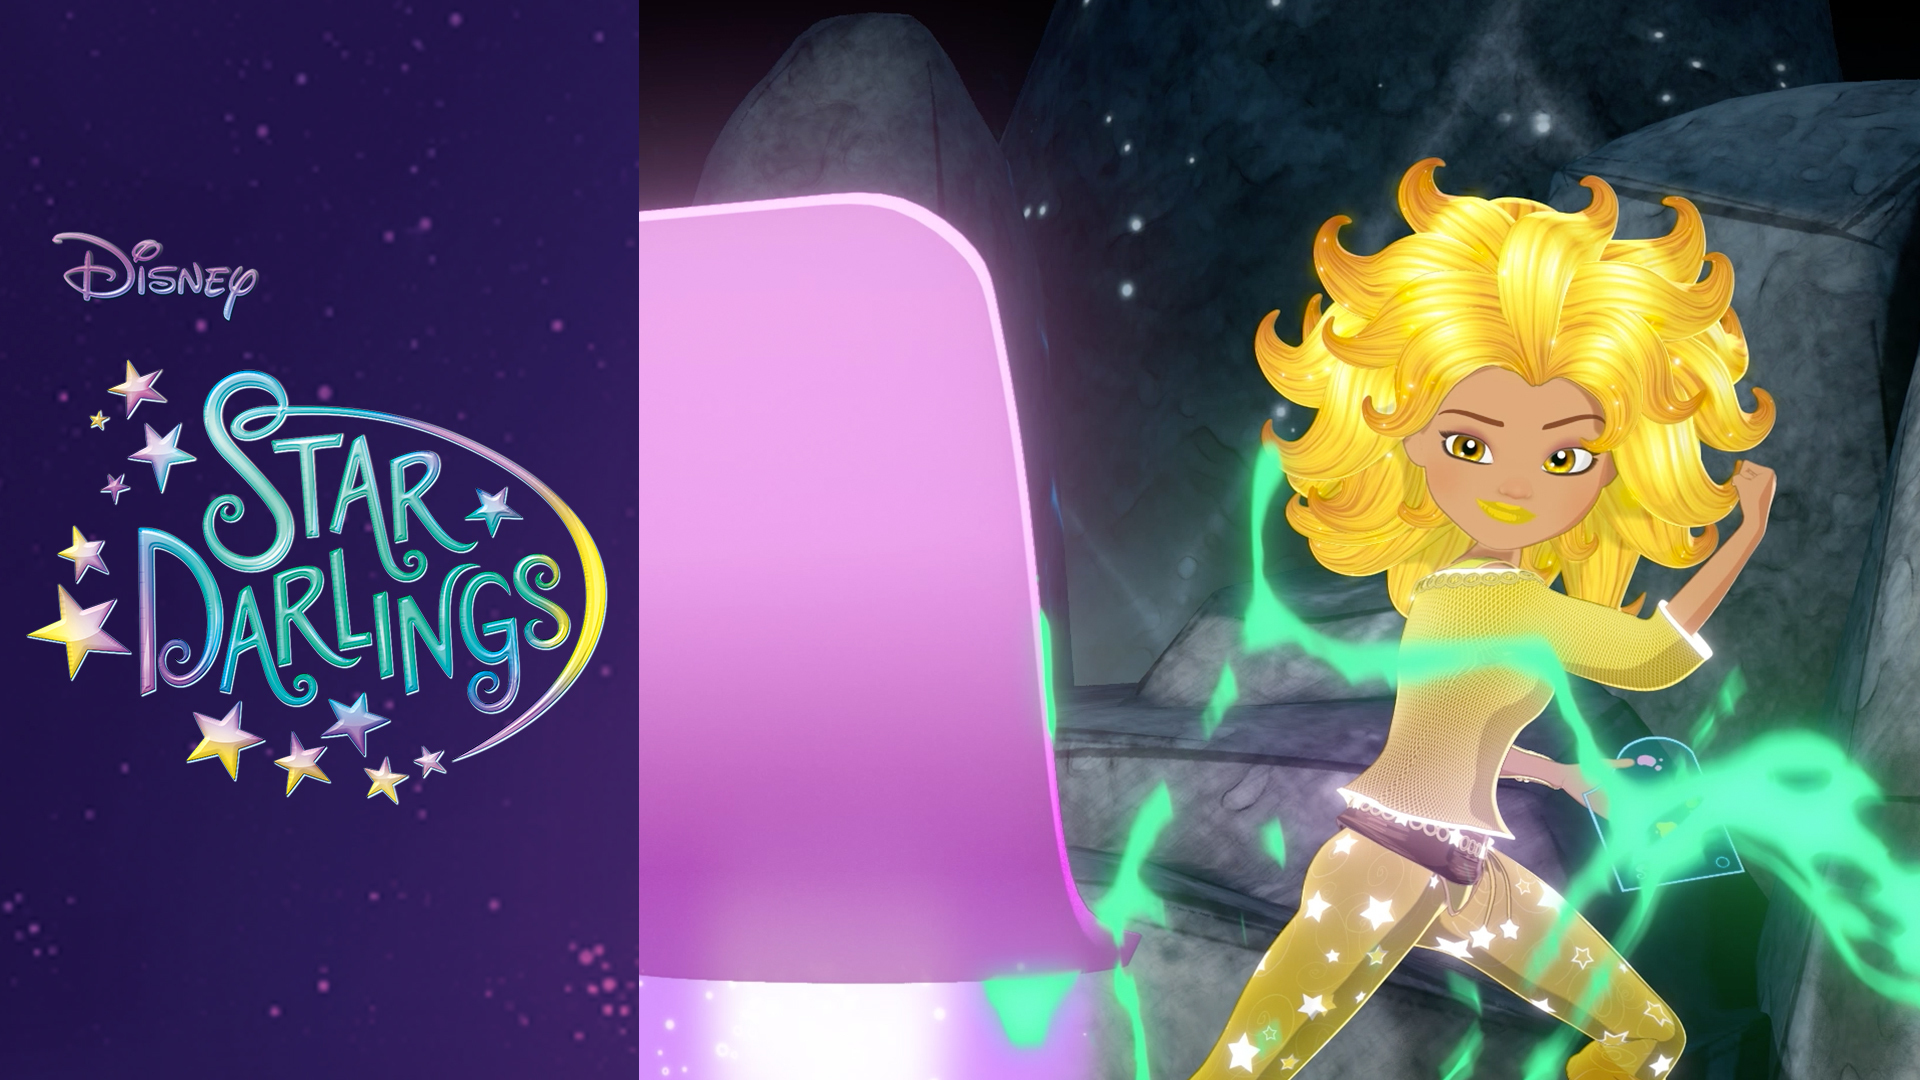 Paint by Numbers - Episode 12 - Disney's Star Darlings